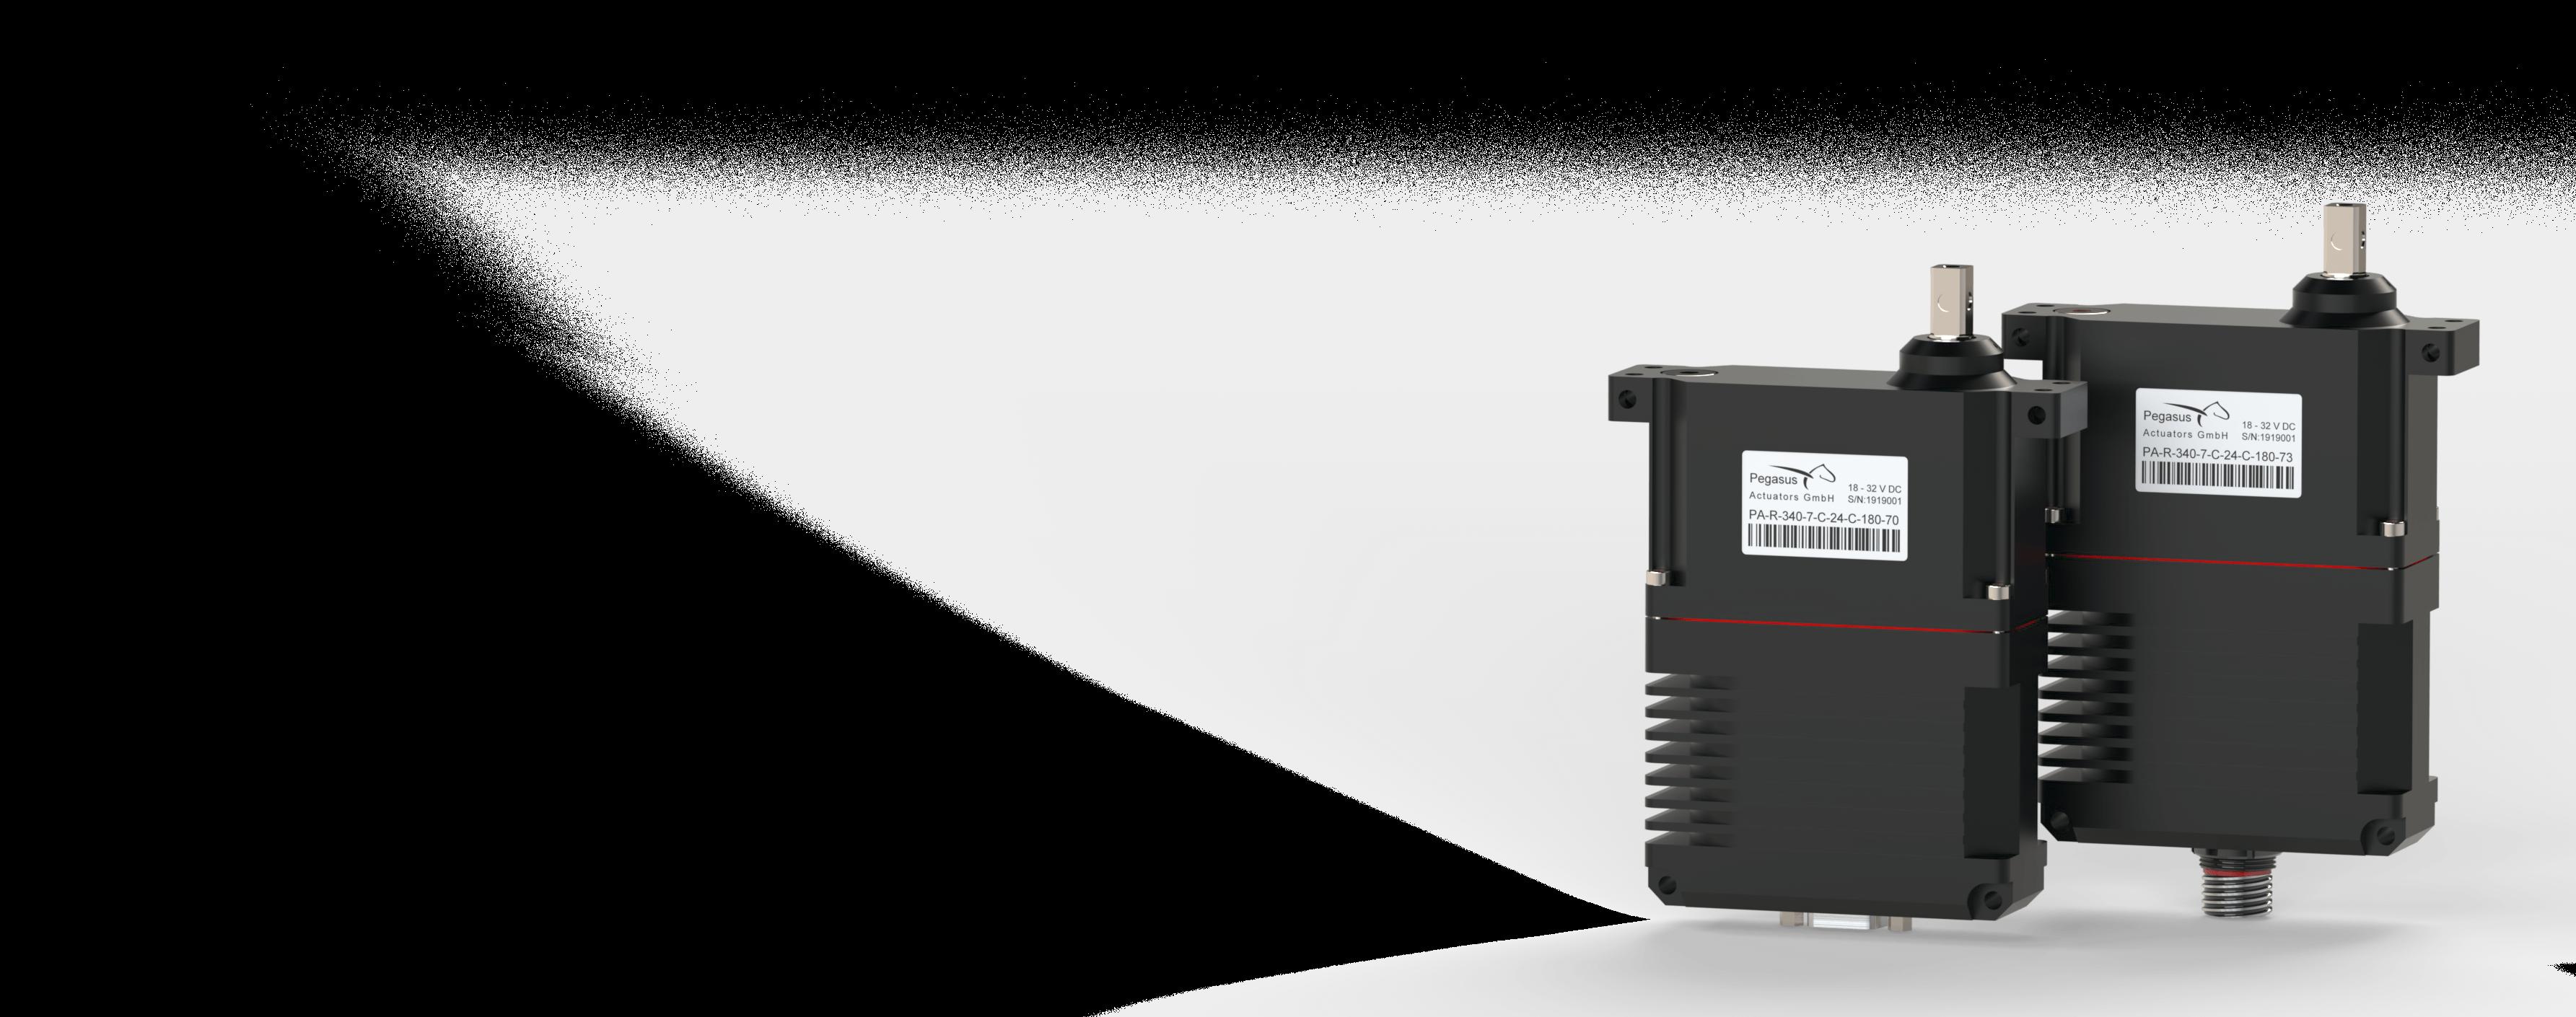 PA-R-340-7 Industrial Actuators